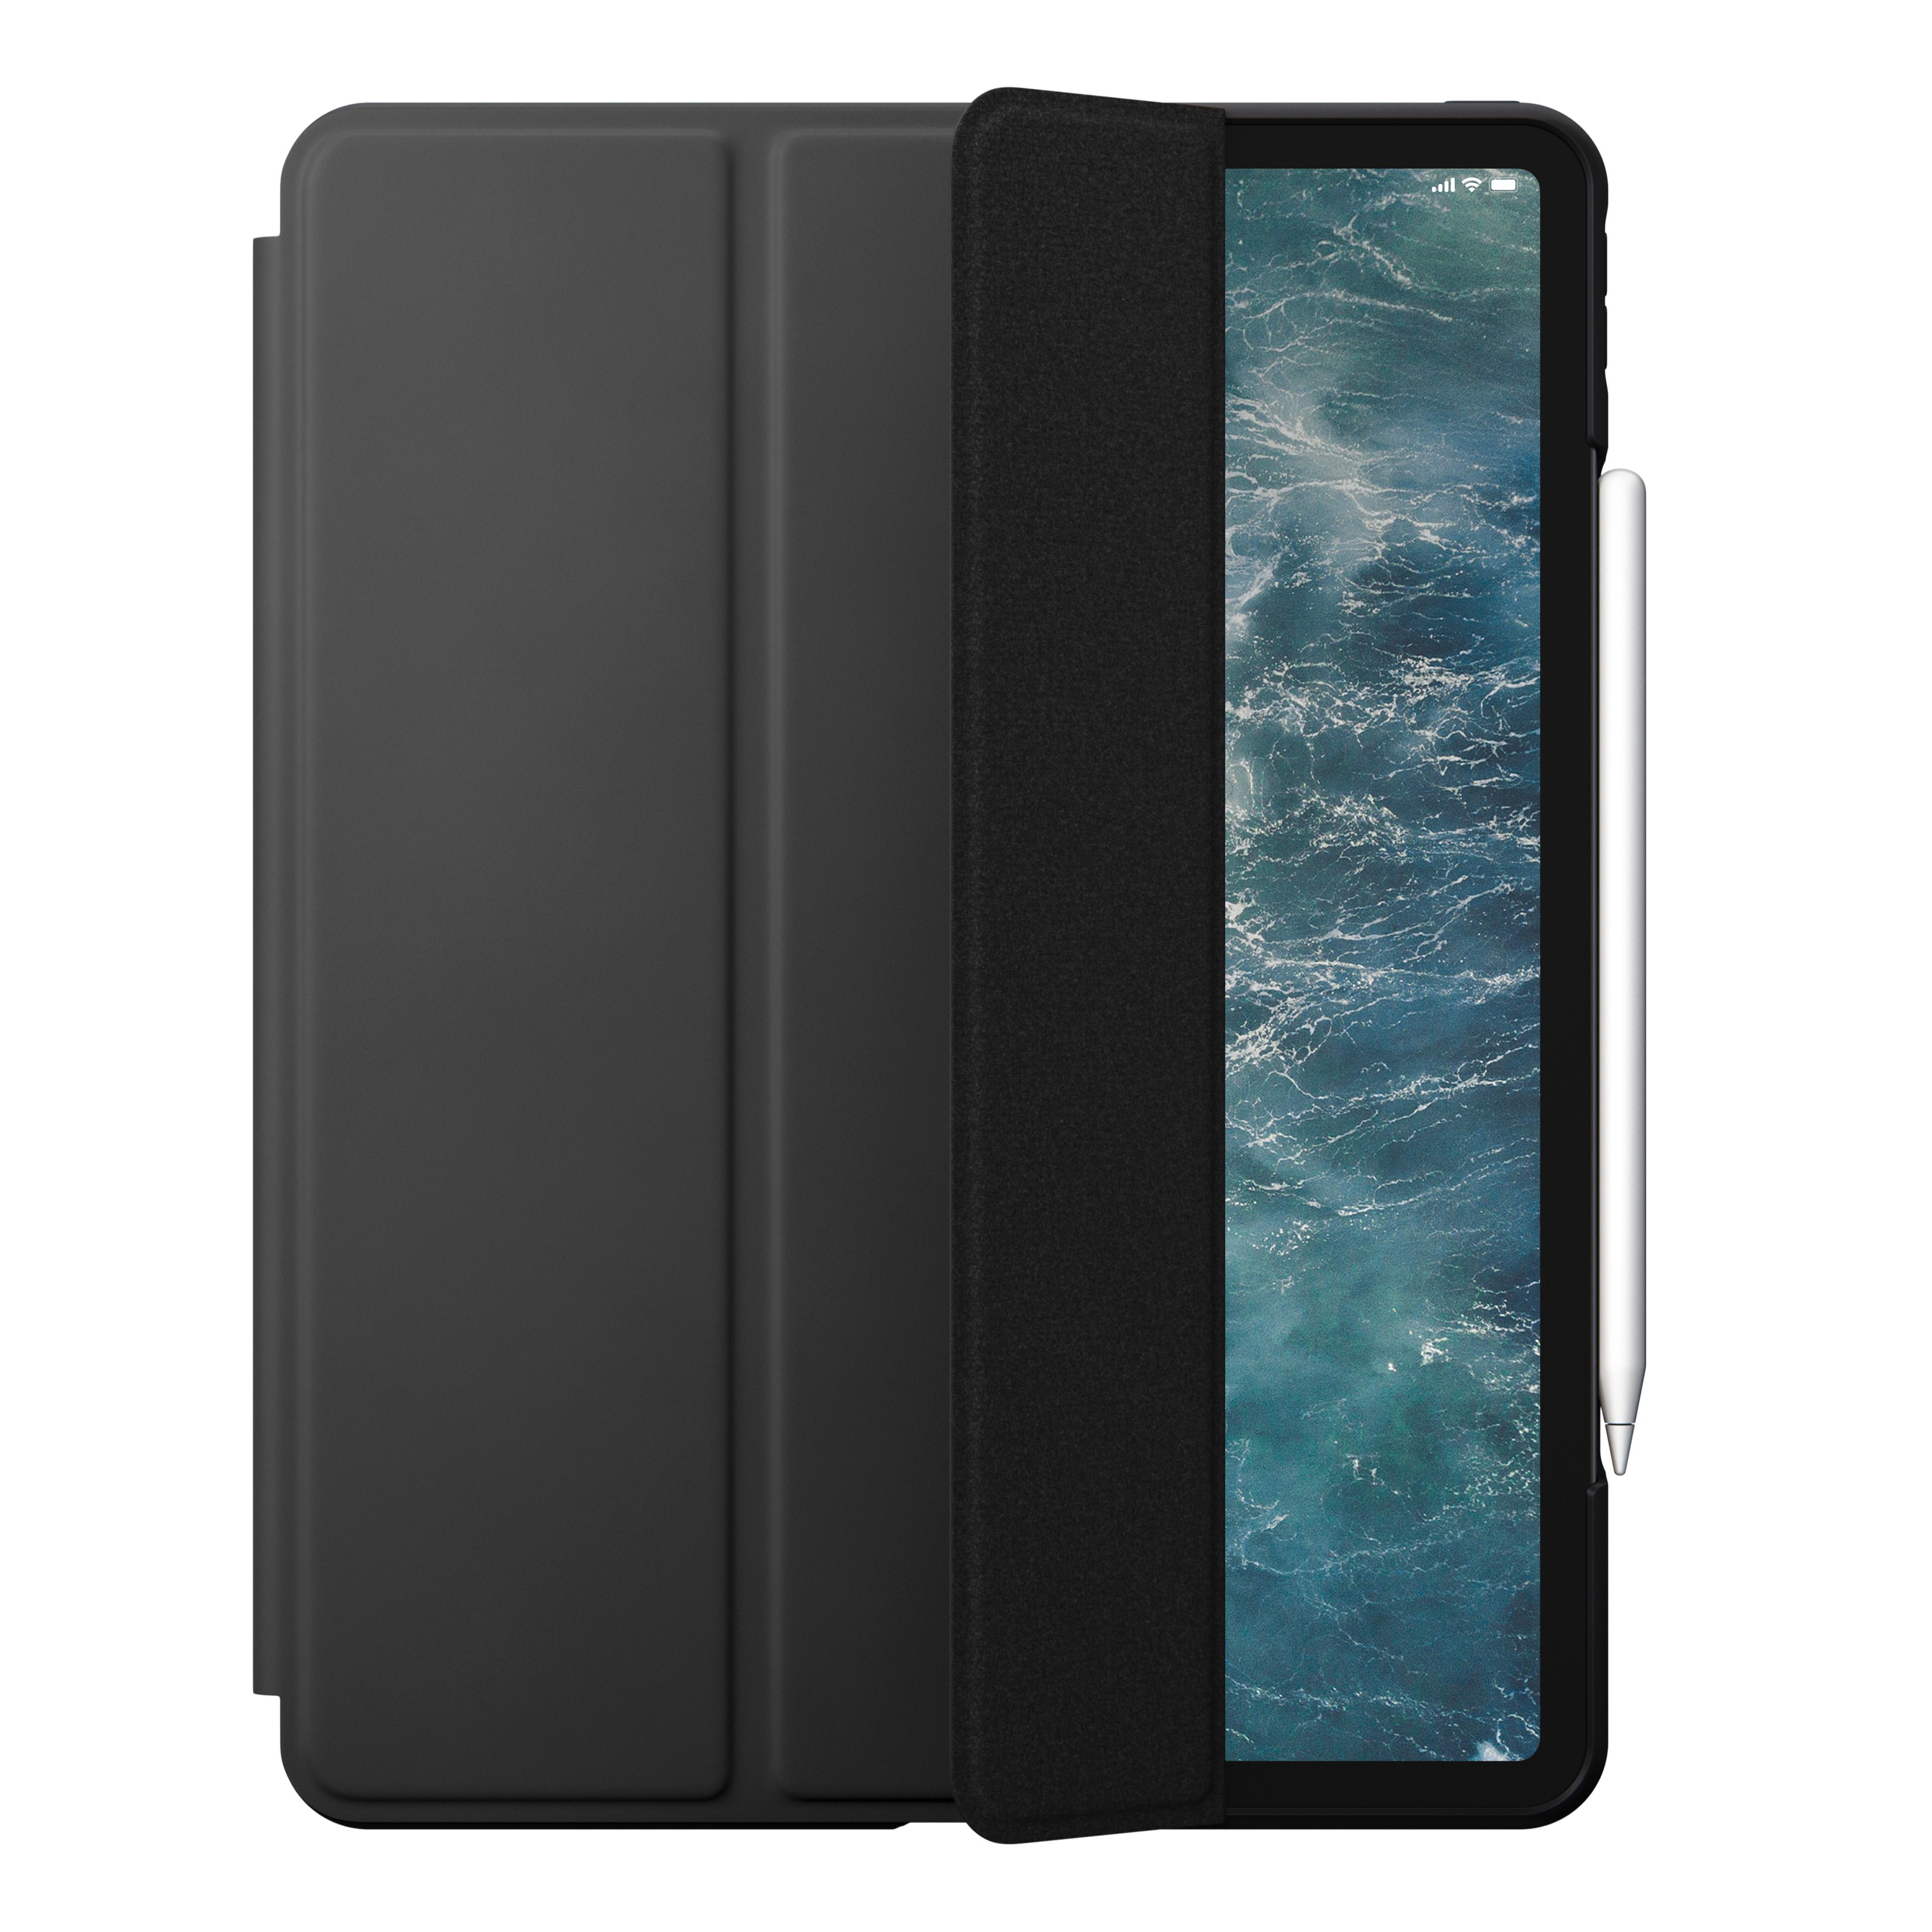 "Nomad Rugged Folio Gray PU - iPad Pro 12.9"" 2018/20"